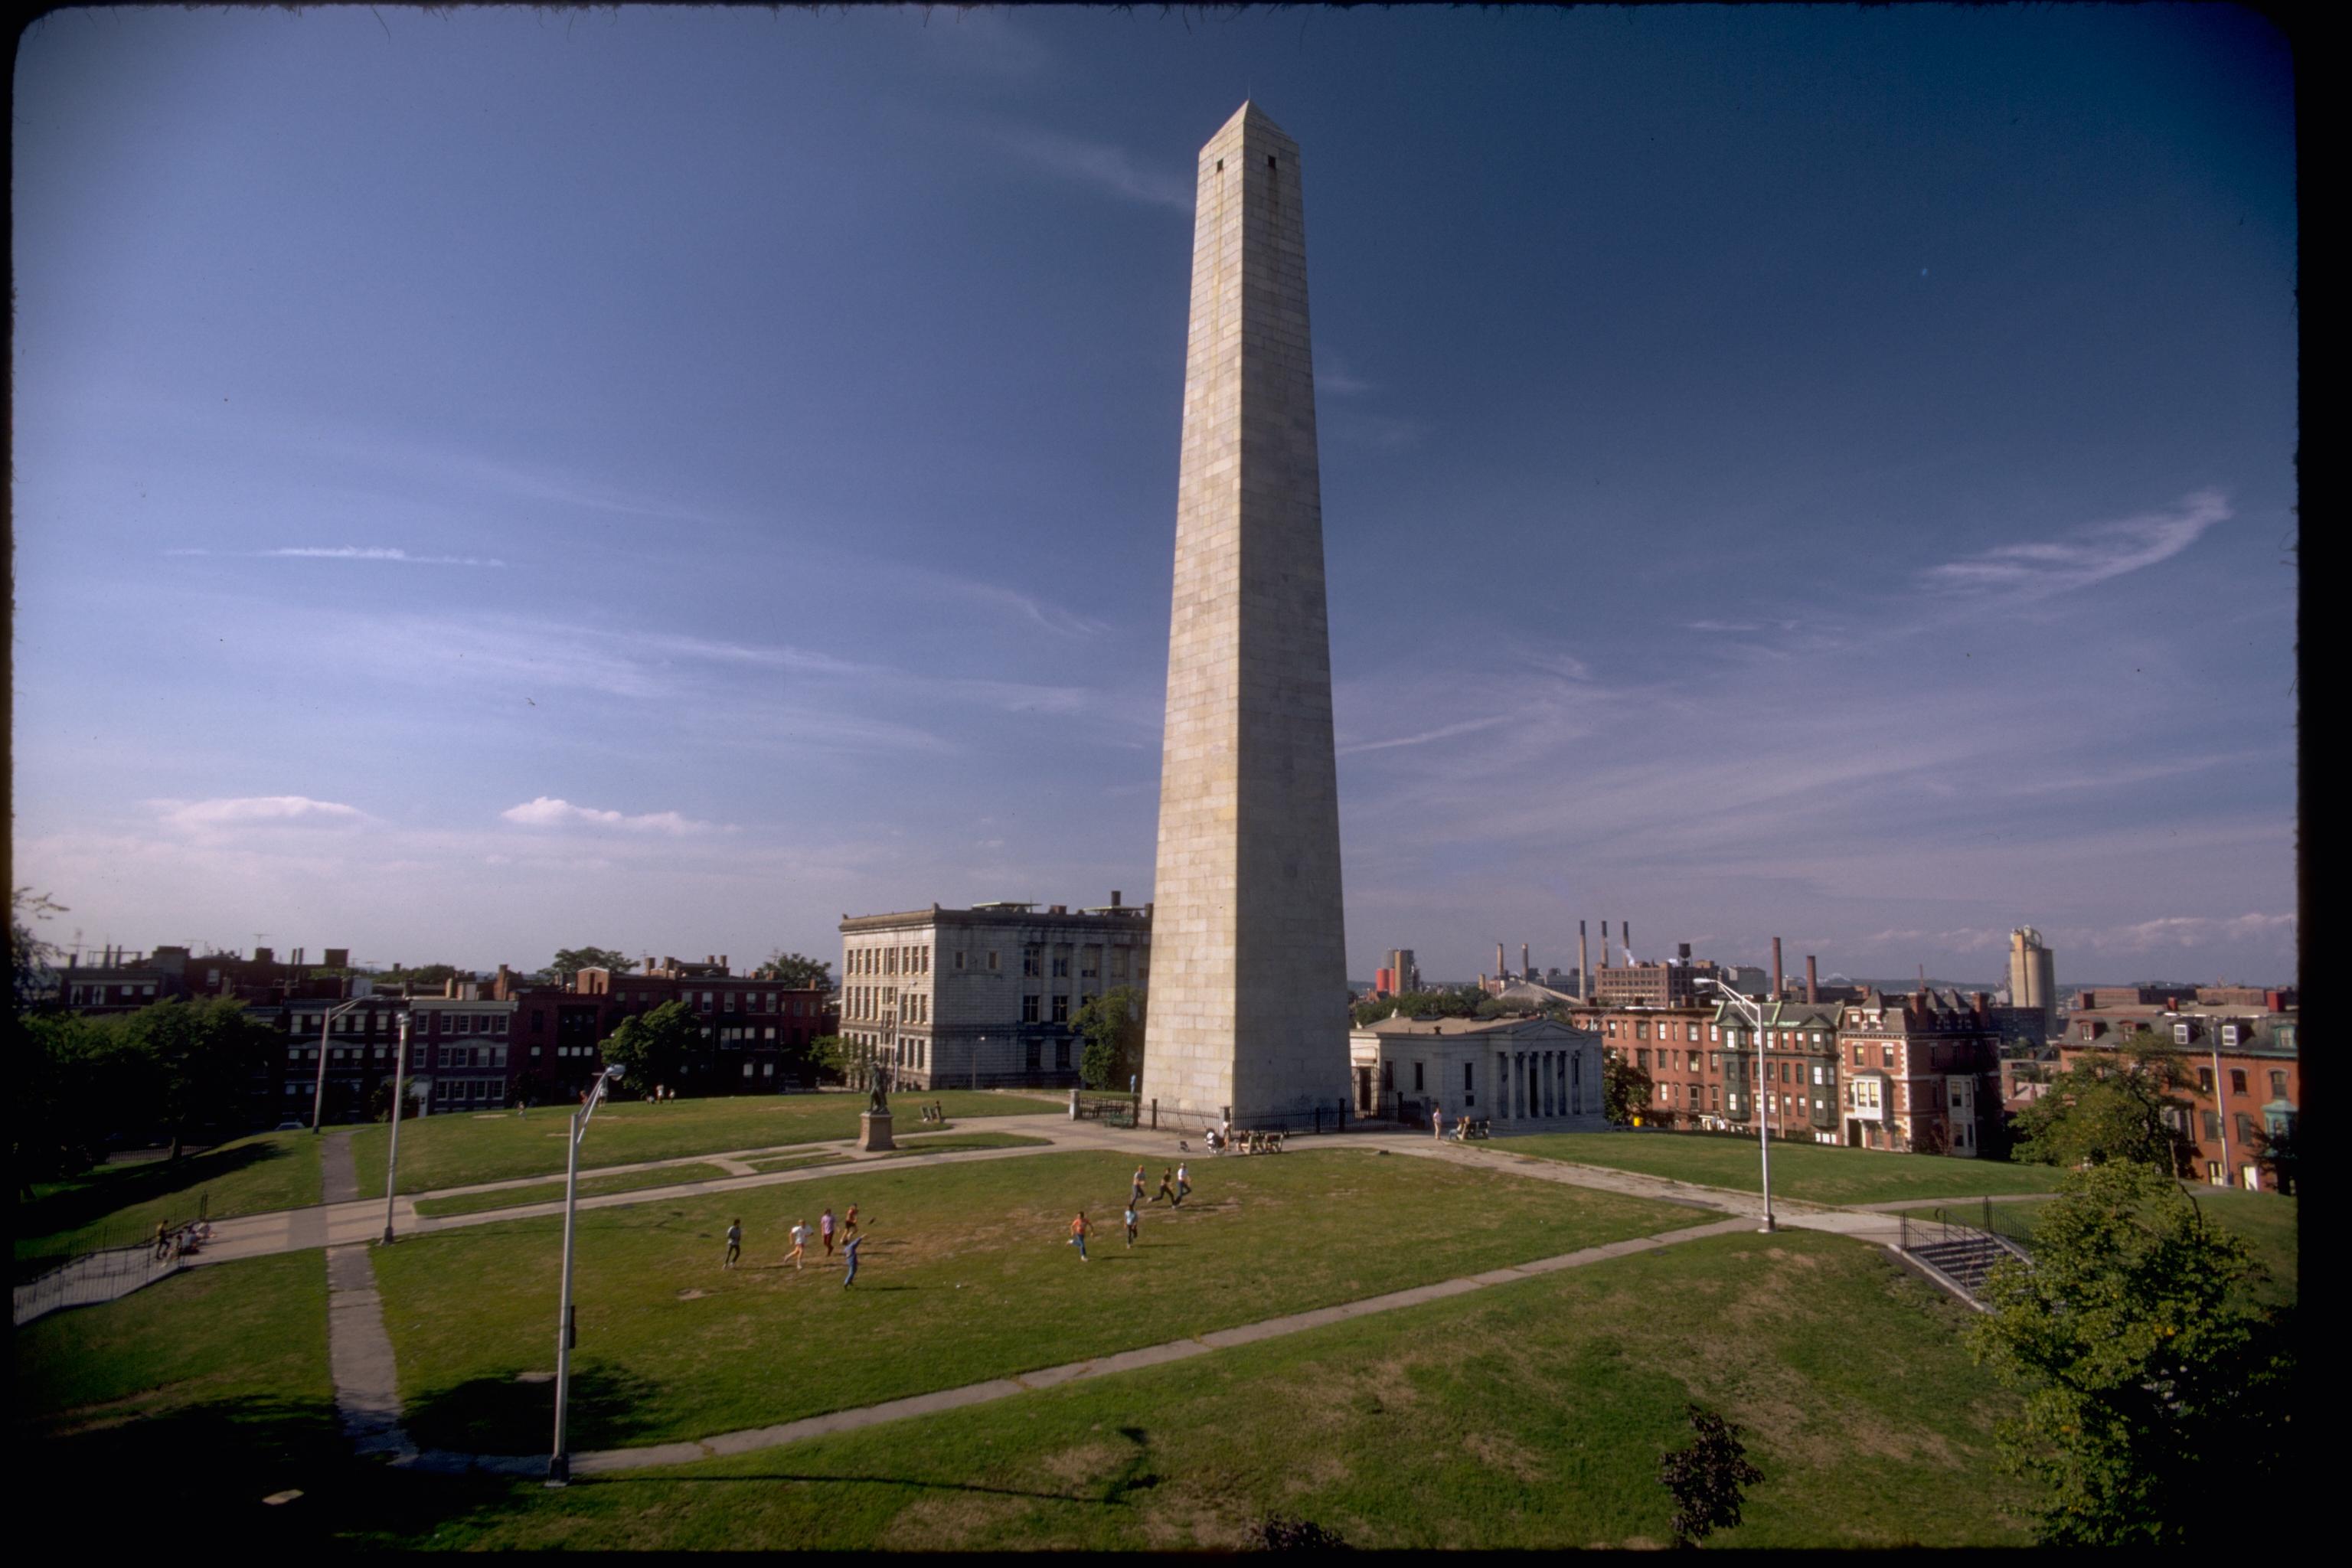 National Park Service Boston Freedom Trail Tour